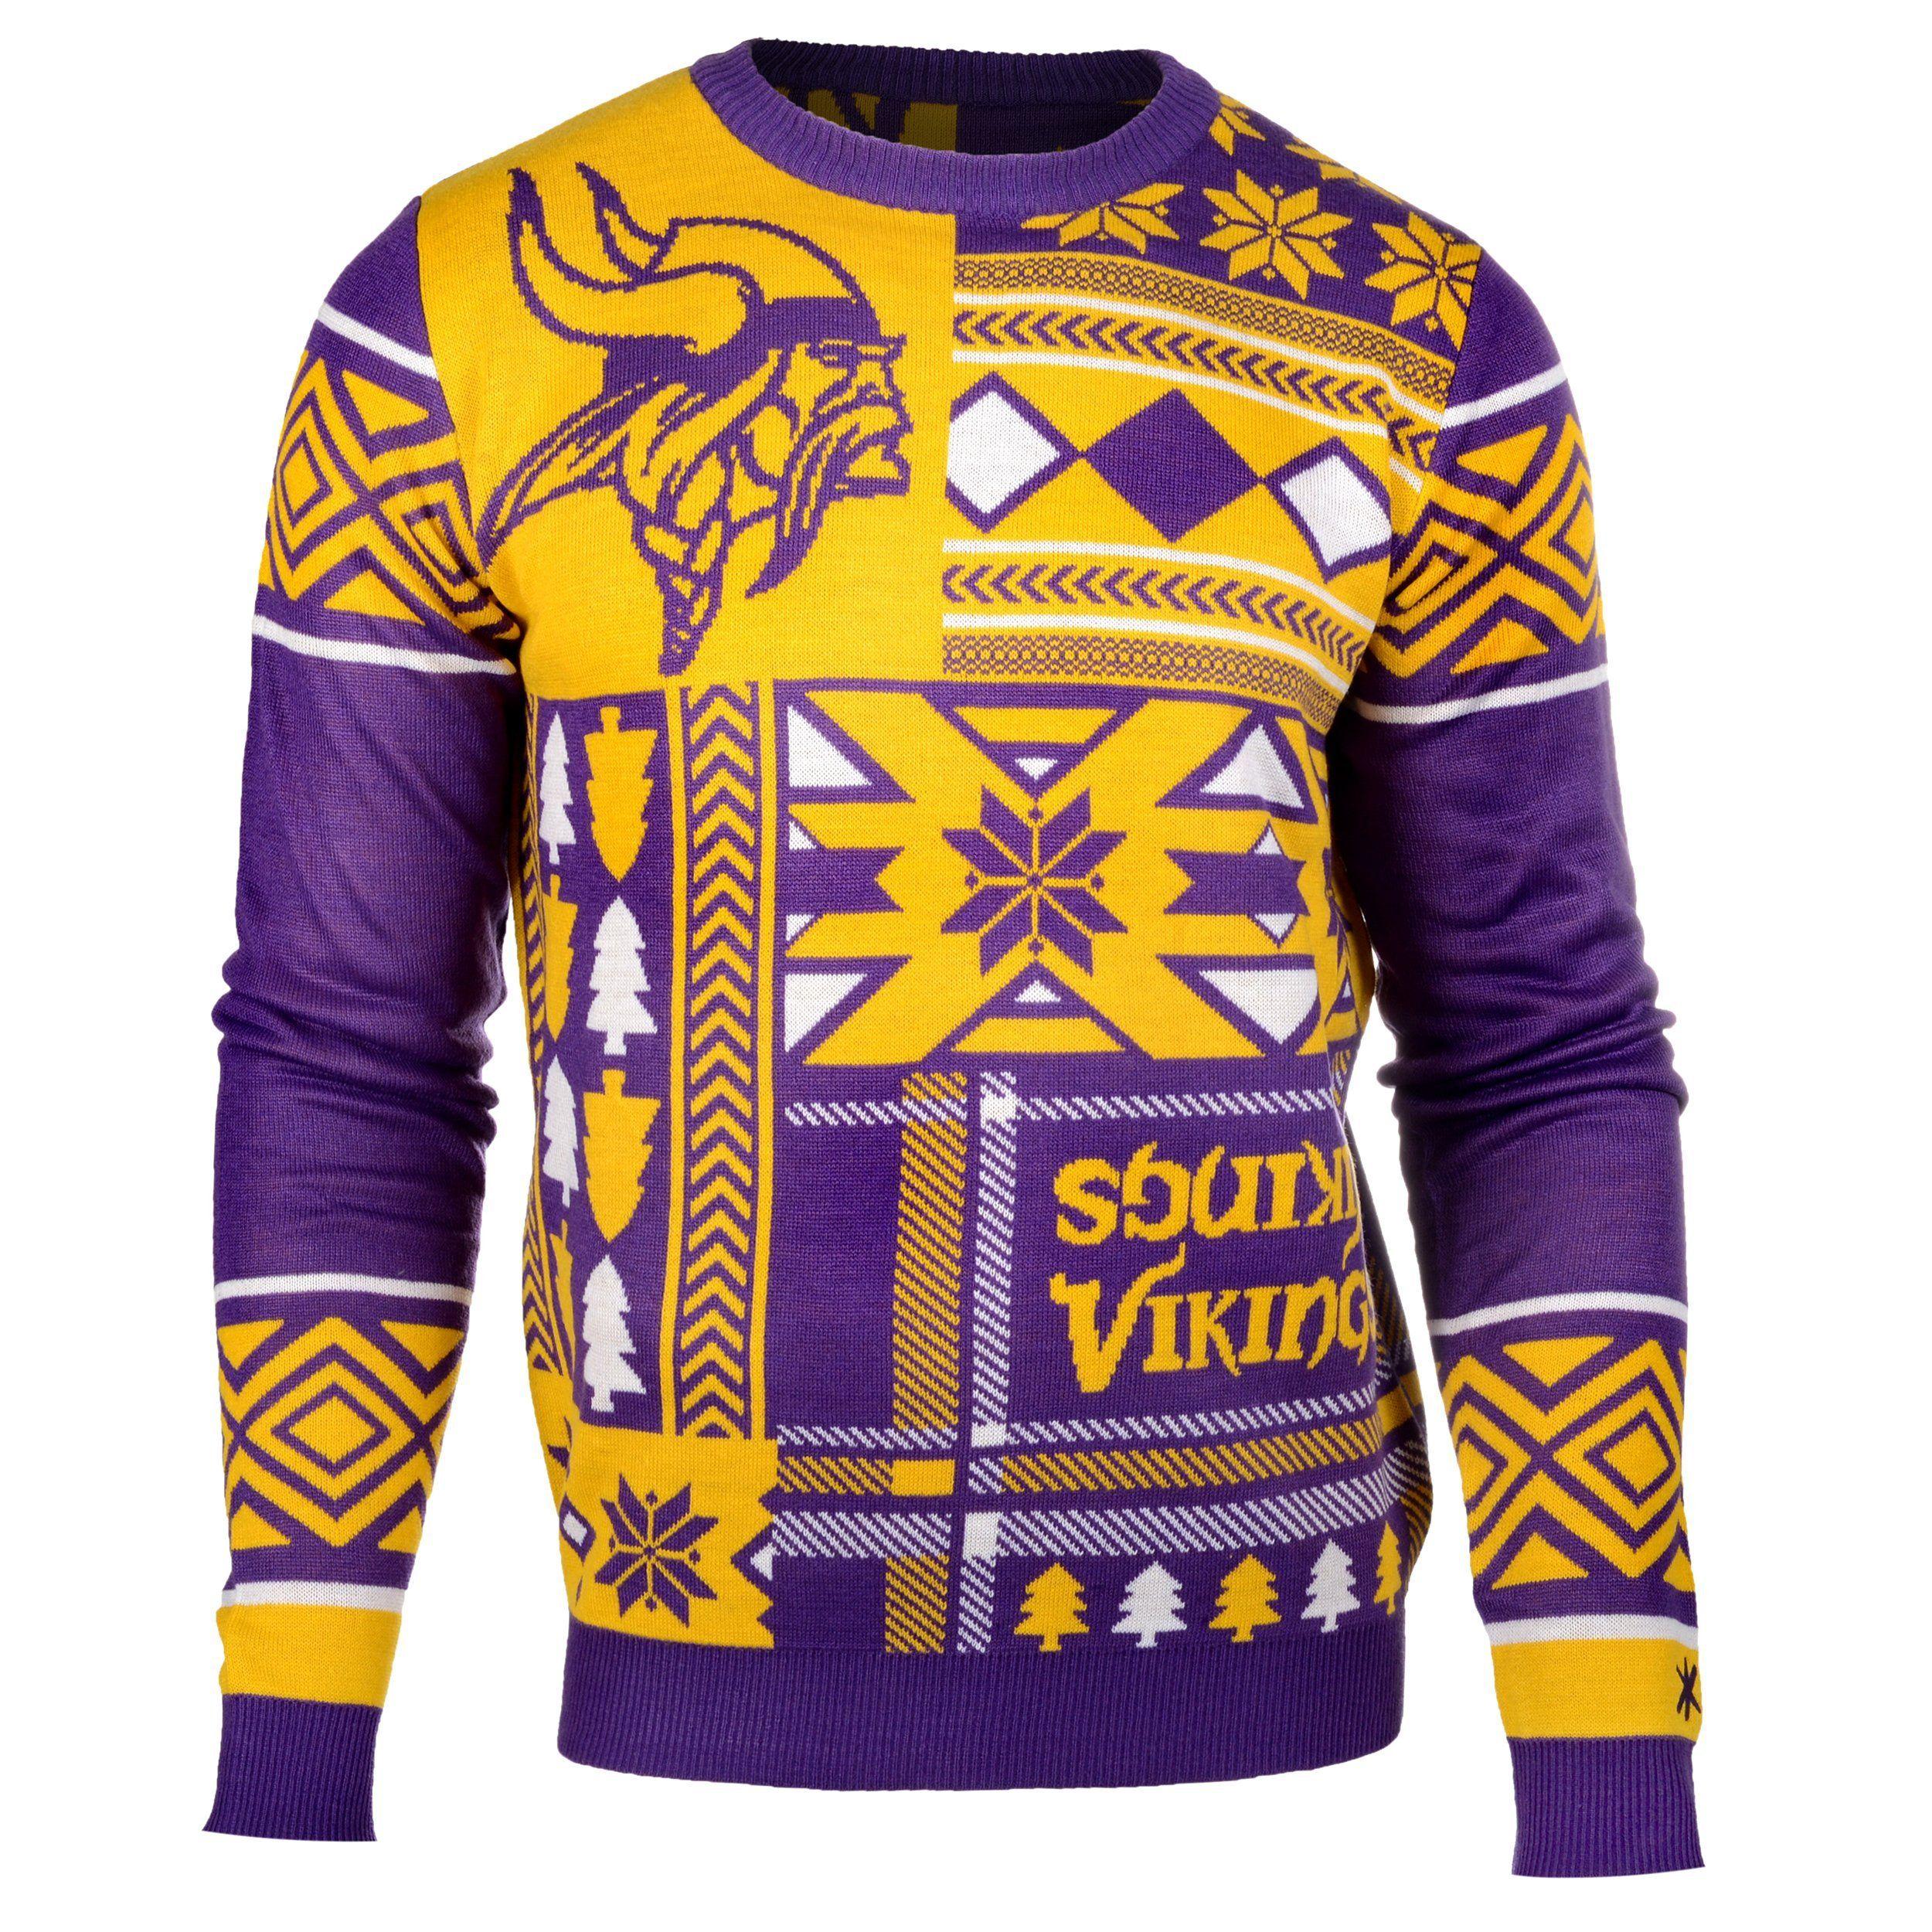 d4457a41 Minnesota Vikings Ugly Christmas Sweaters #Christmas #Gifts | Sports ...